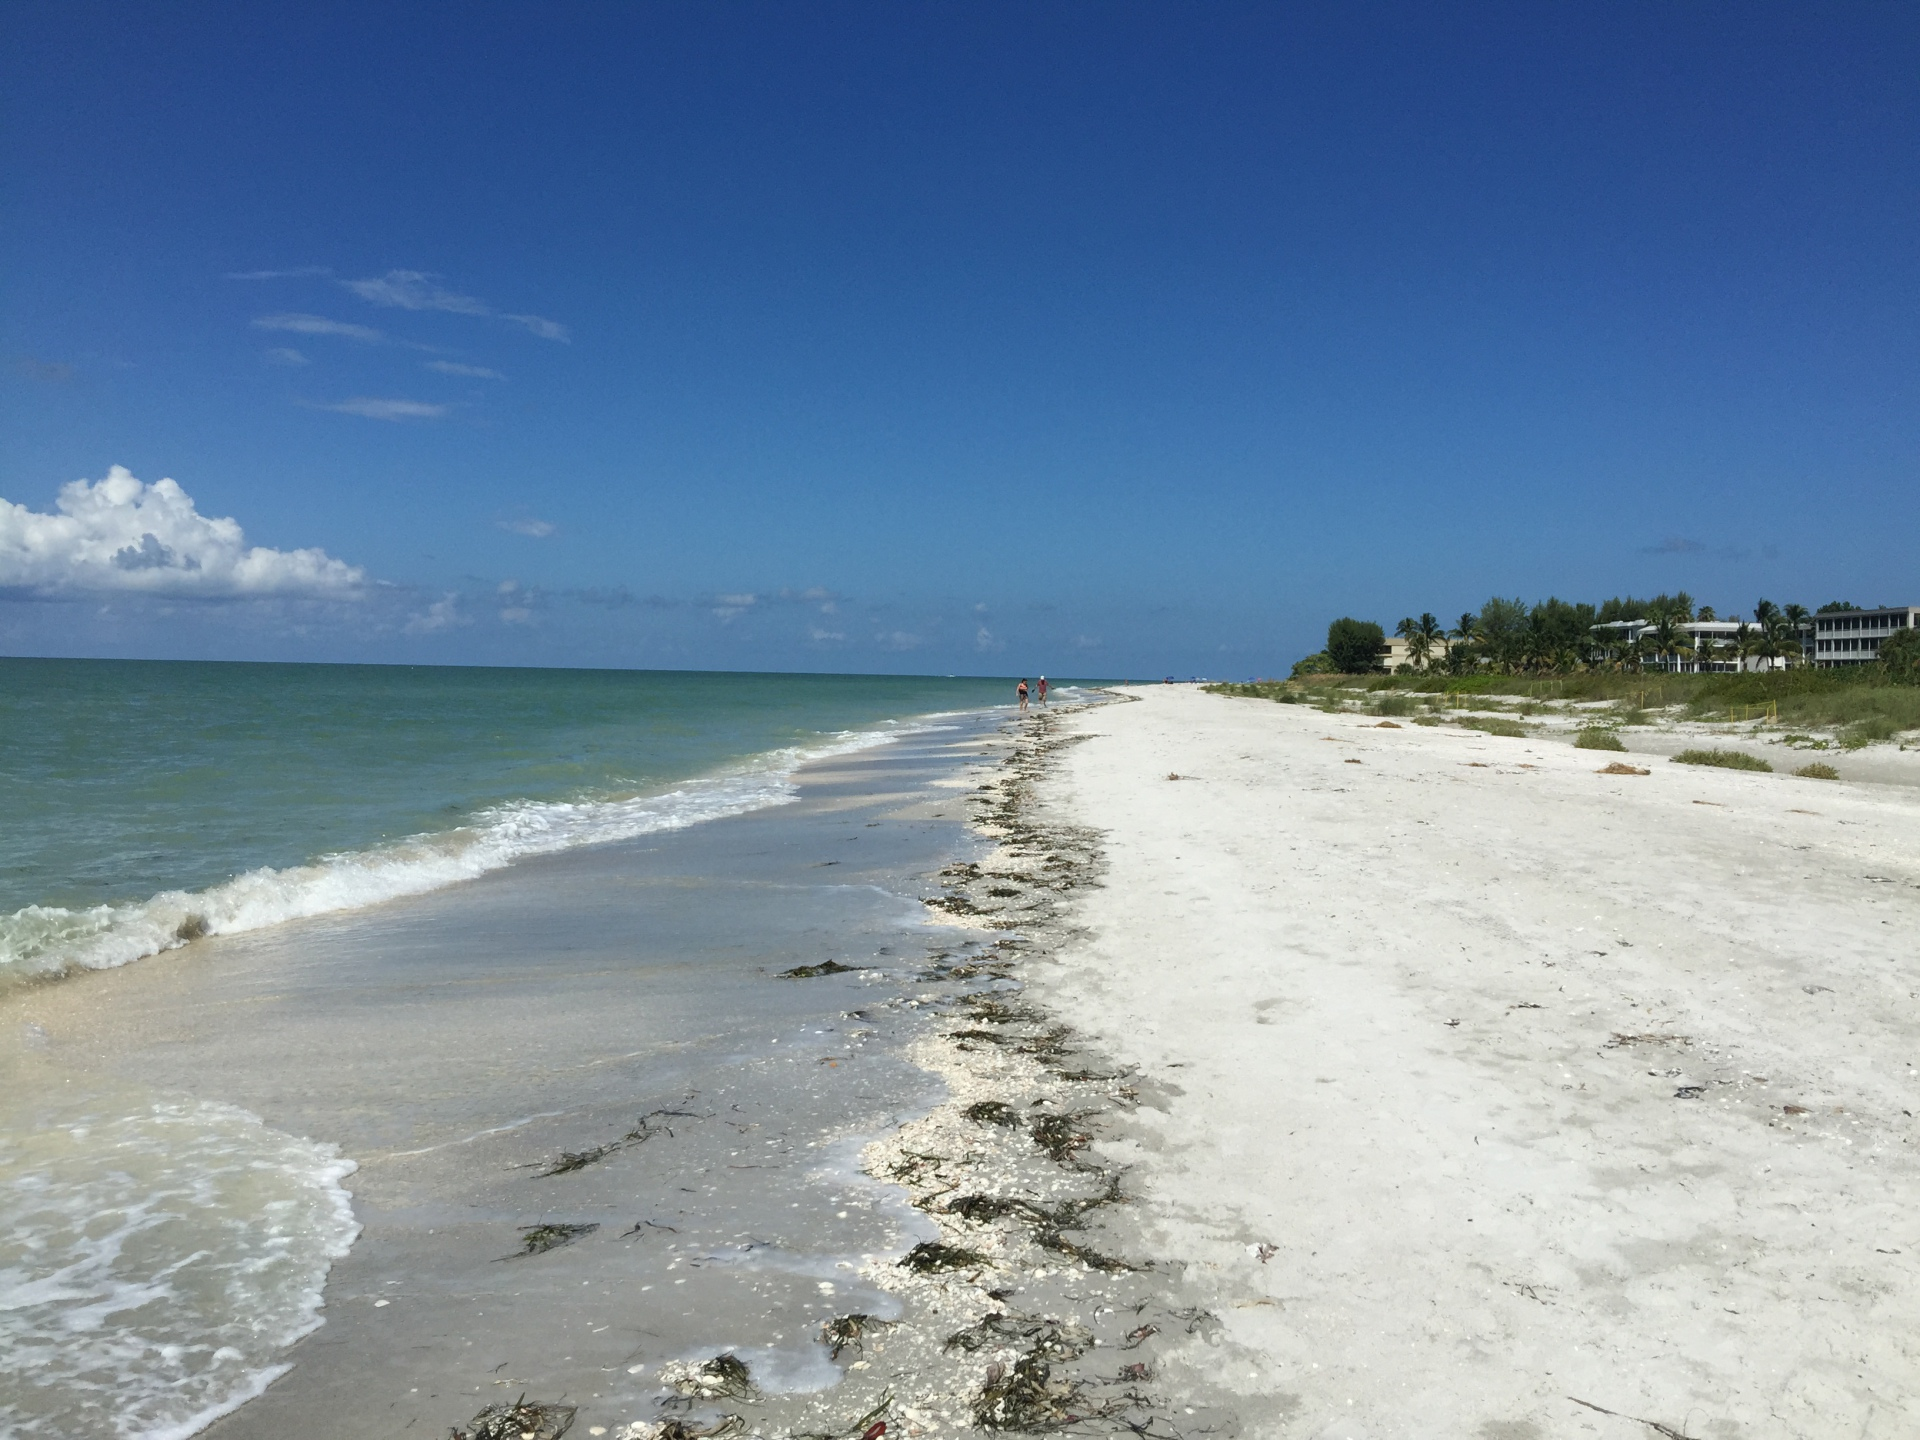 The beach by the condo